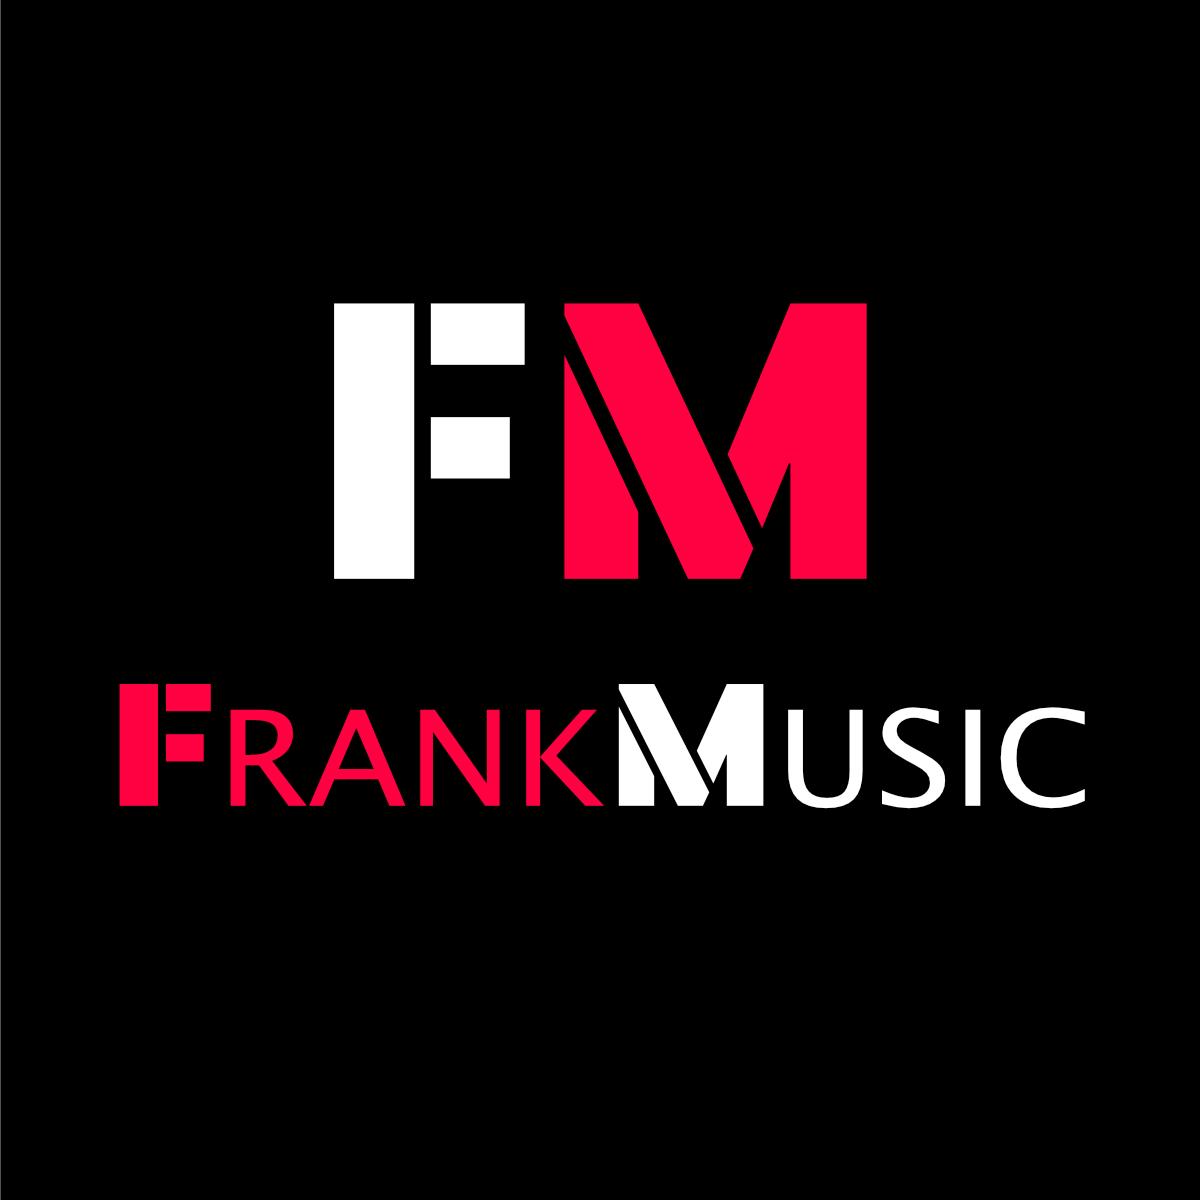 FRANKMUSIC